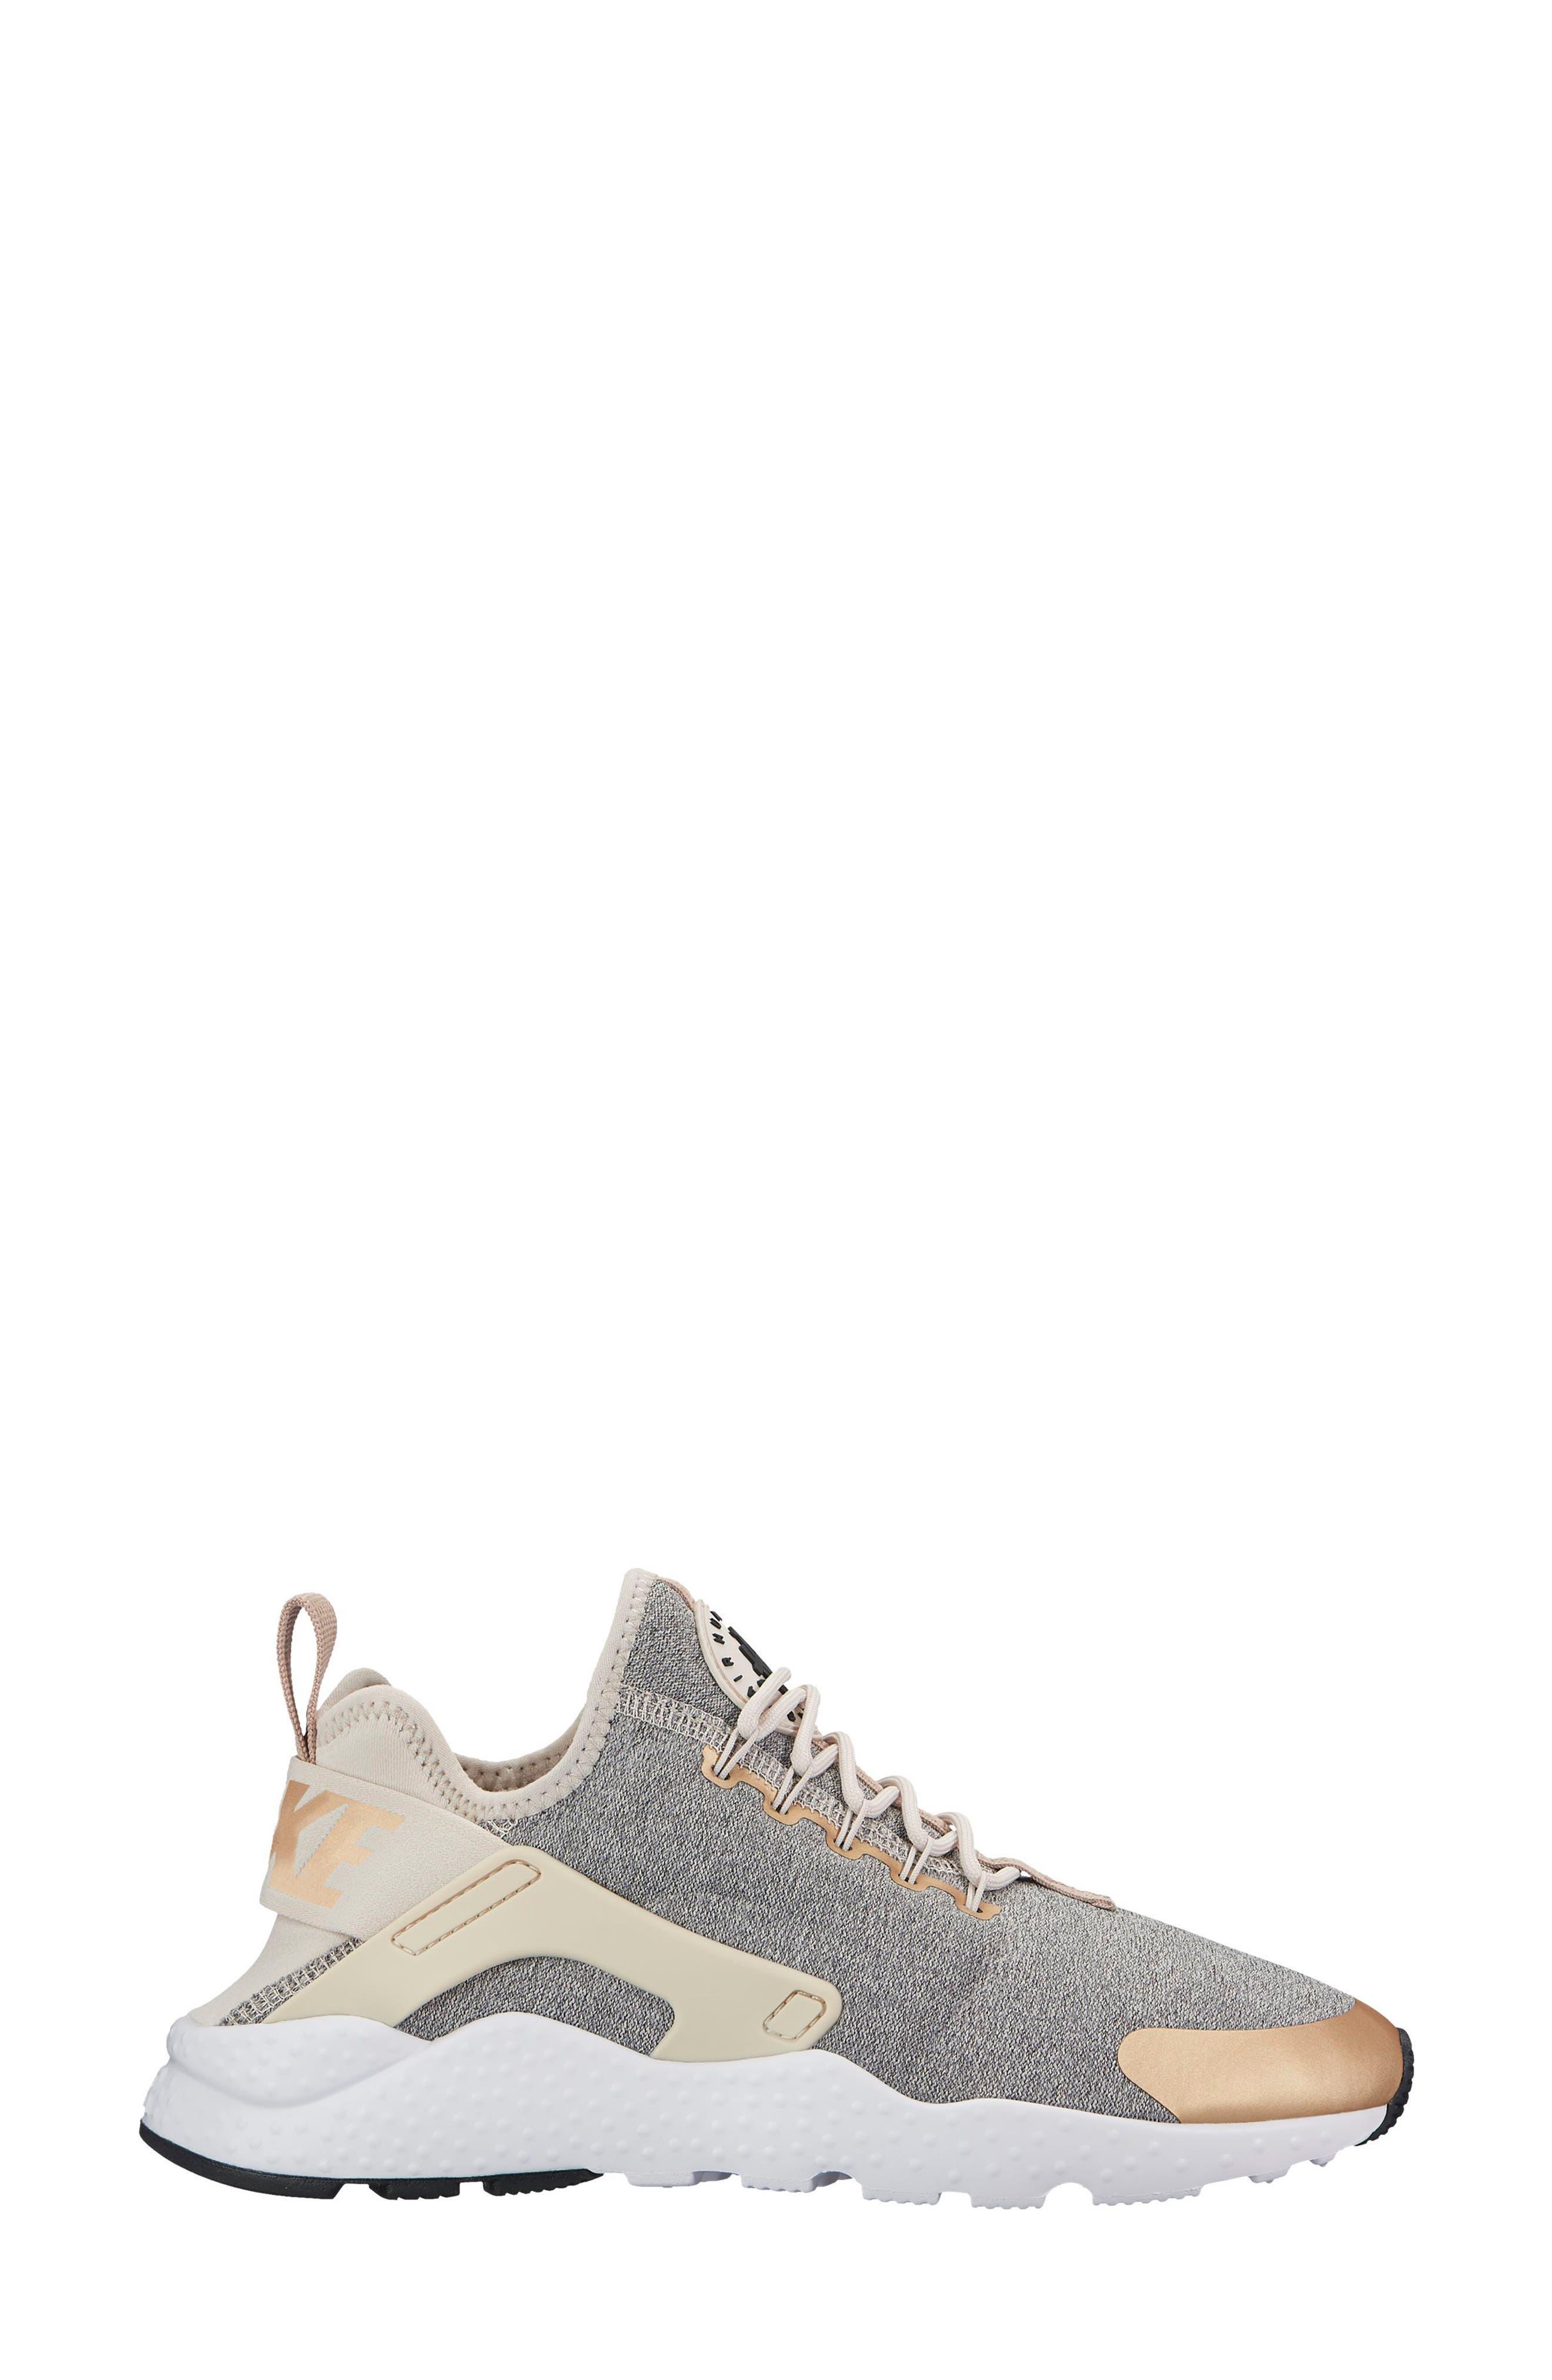 NIKE,                             'Air Huarache Run Ultra SE' Sneaker,                             Alternate thumbnail 7, color,                             285